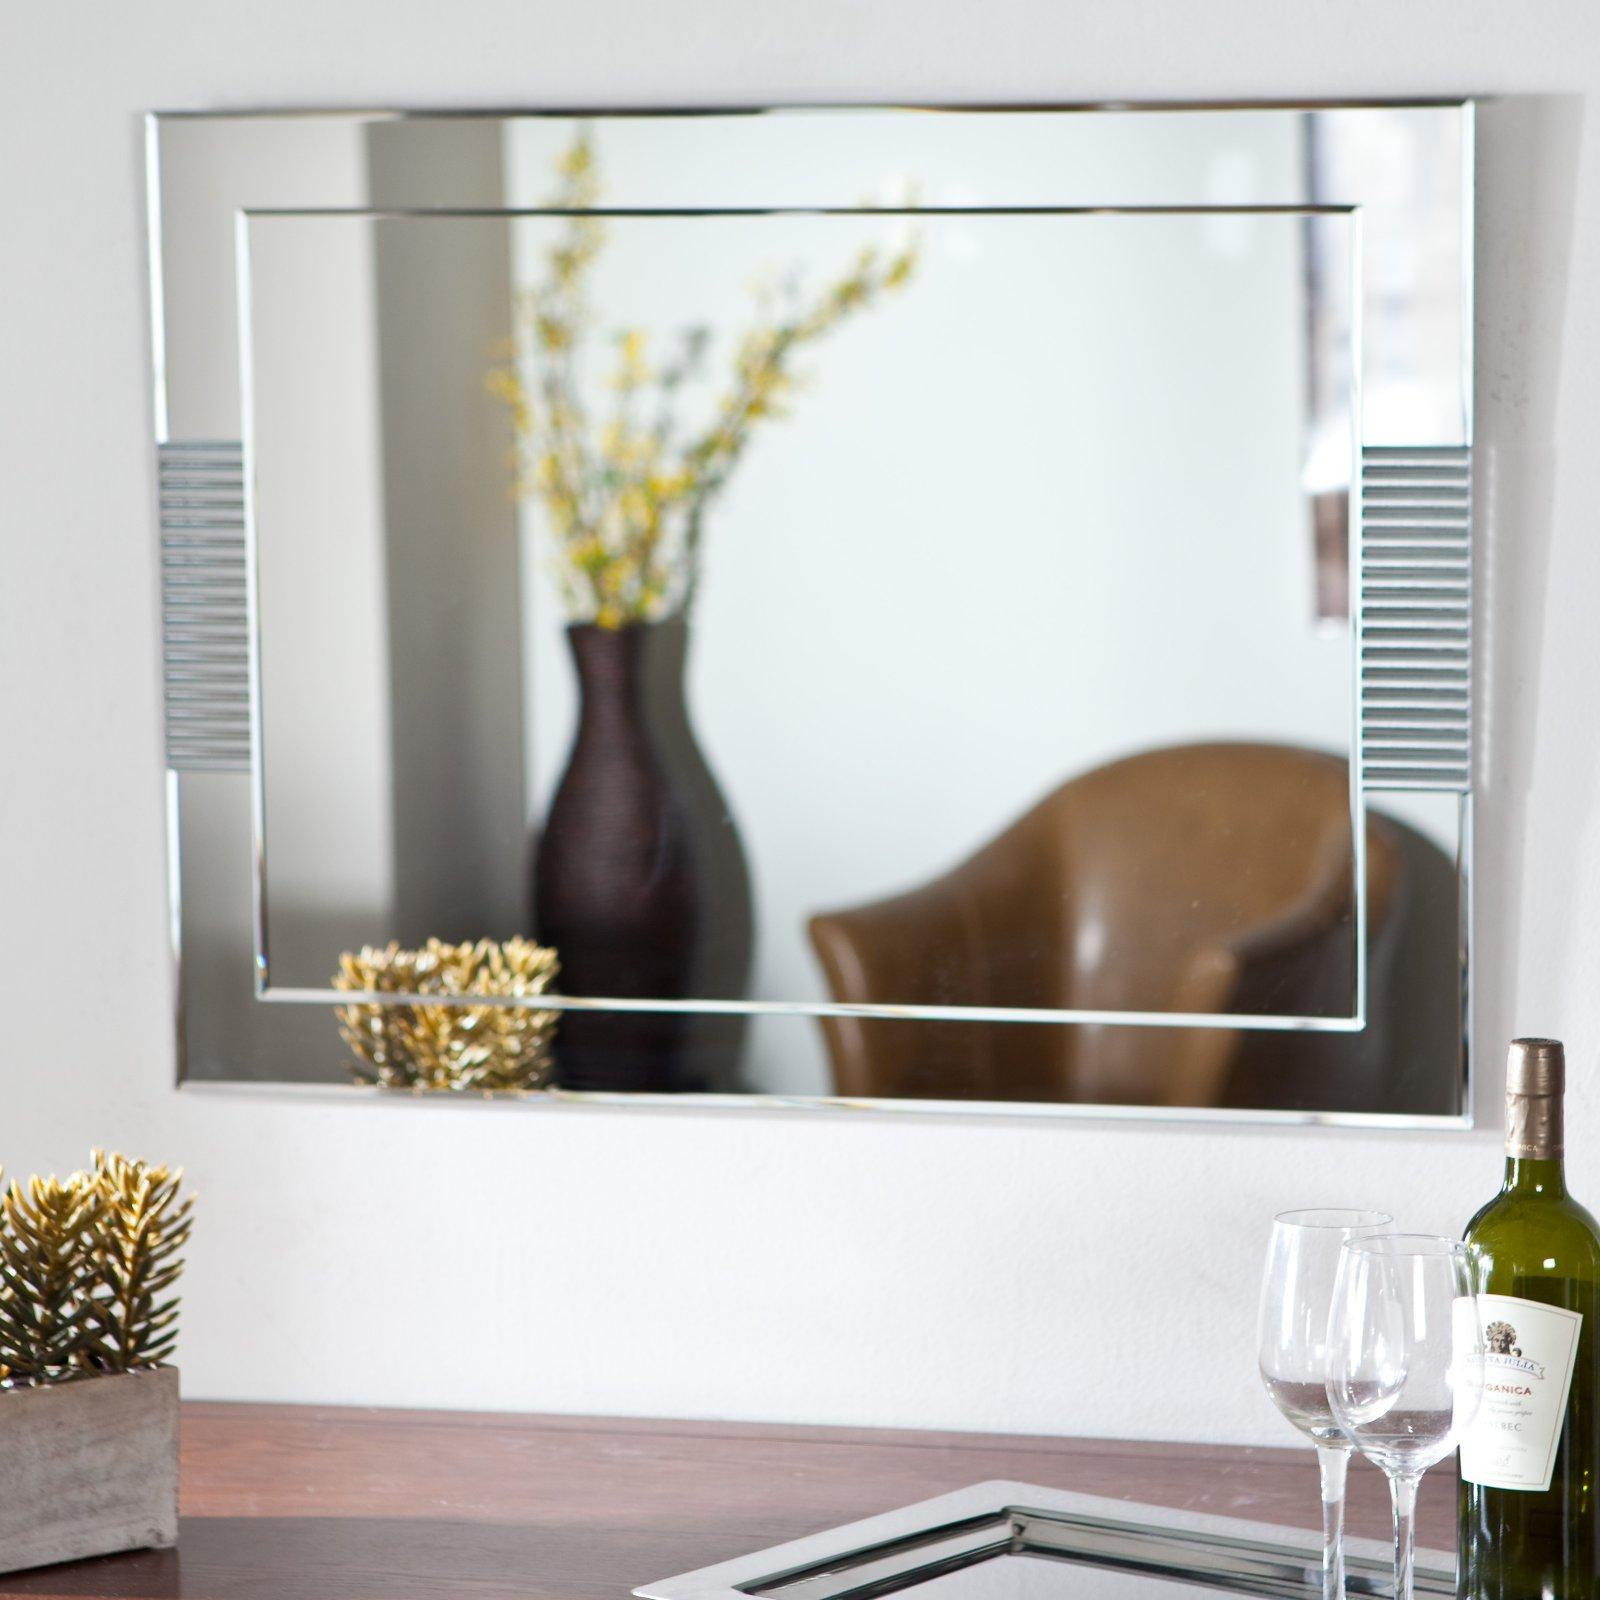 Décor Wonderland Francisca Large Frameless Wall Mirror - 23.6W x 31.5H